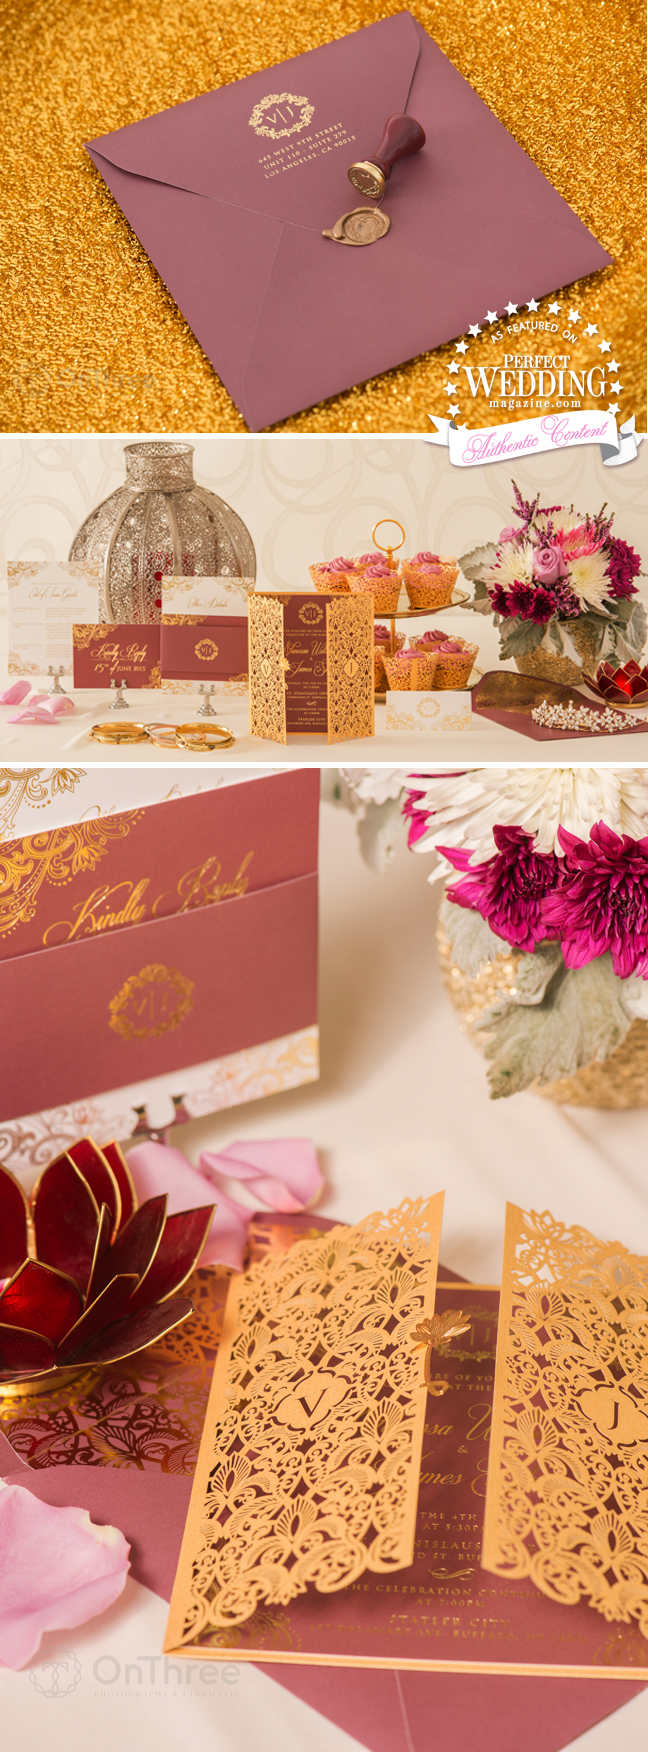 Vanessa Williams, Vanessa Williams Wedding Stationery, Vanessa Williams Wedding, Marsala, Egyptian Wedding, Perfect Wedding Blog